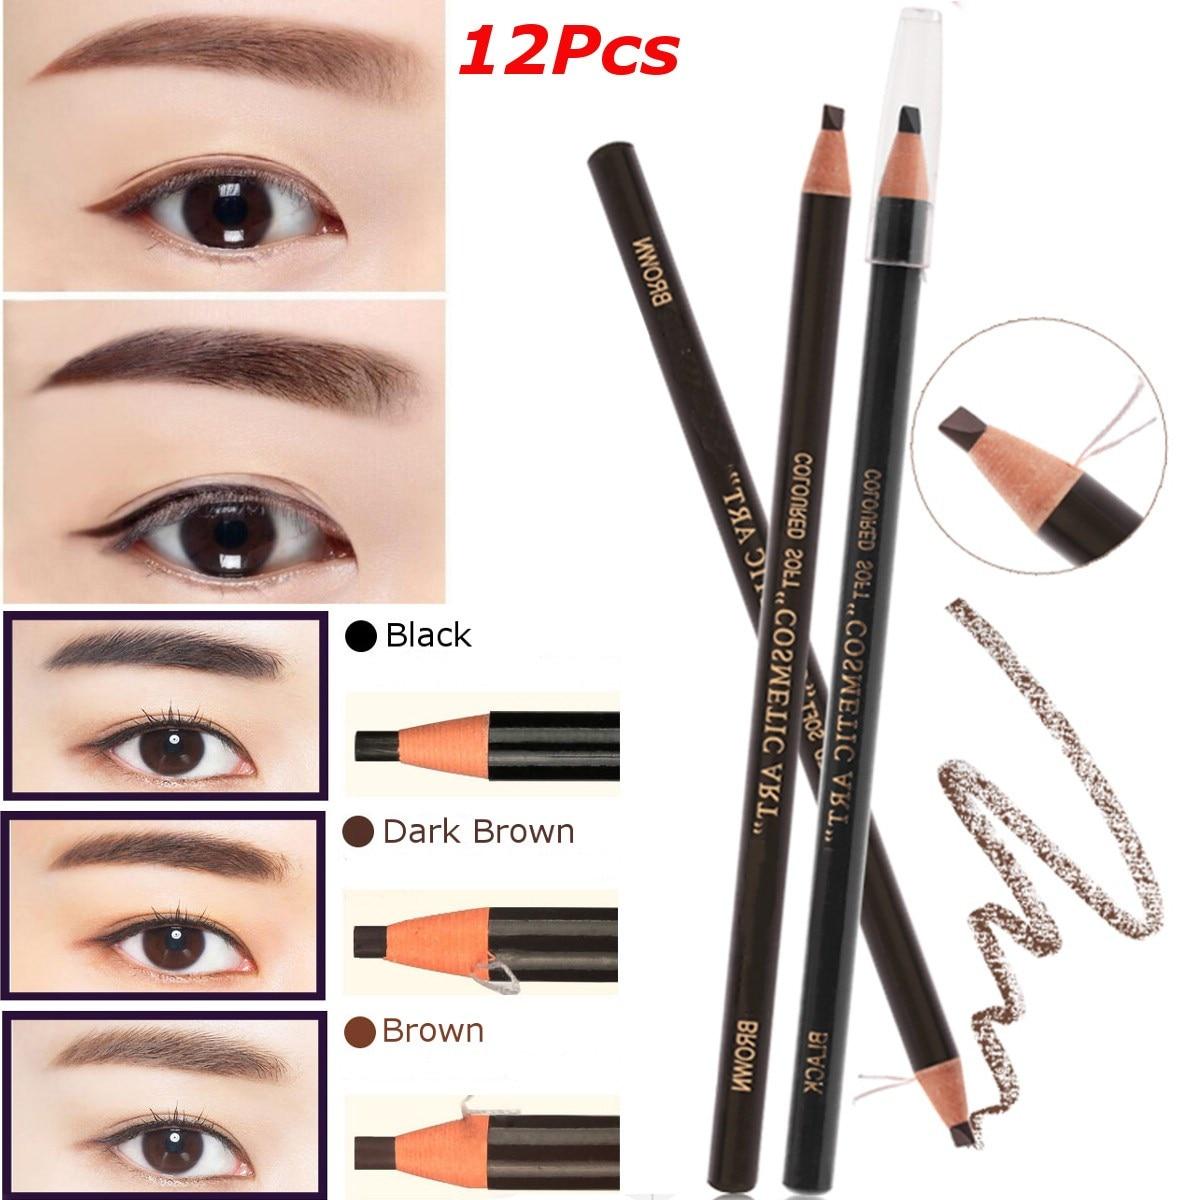 ¡Oferta! 12 unids/set de lápiz para cejas, lápiz para maquillaje de cejas, lápiz para cosméticos, resistente al agua, estéreo, maquillaje permanente, herramienta de arte para tatuajes